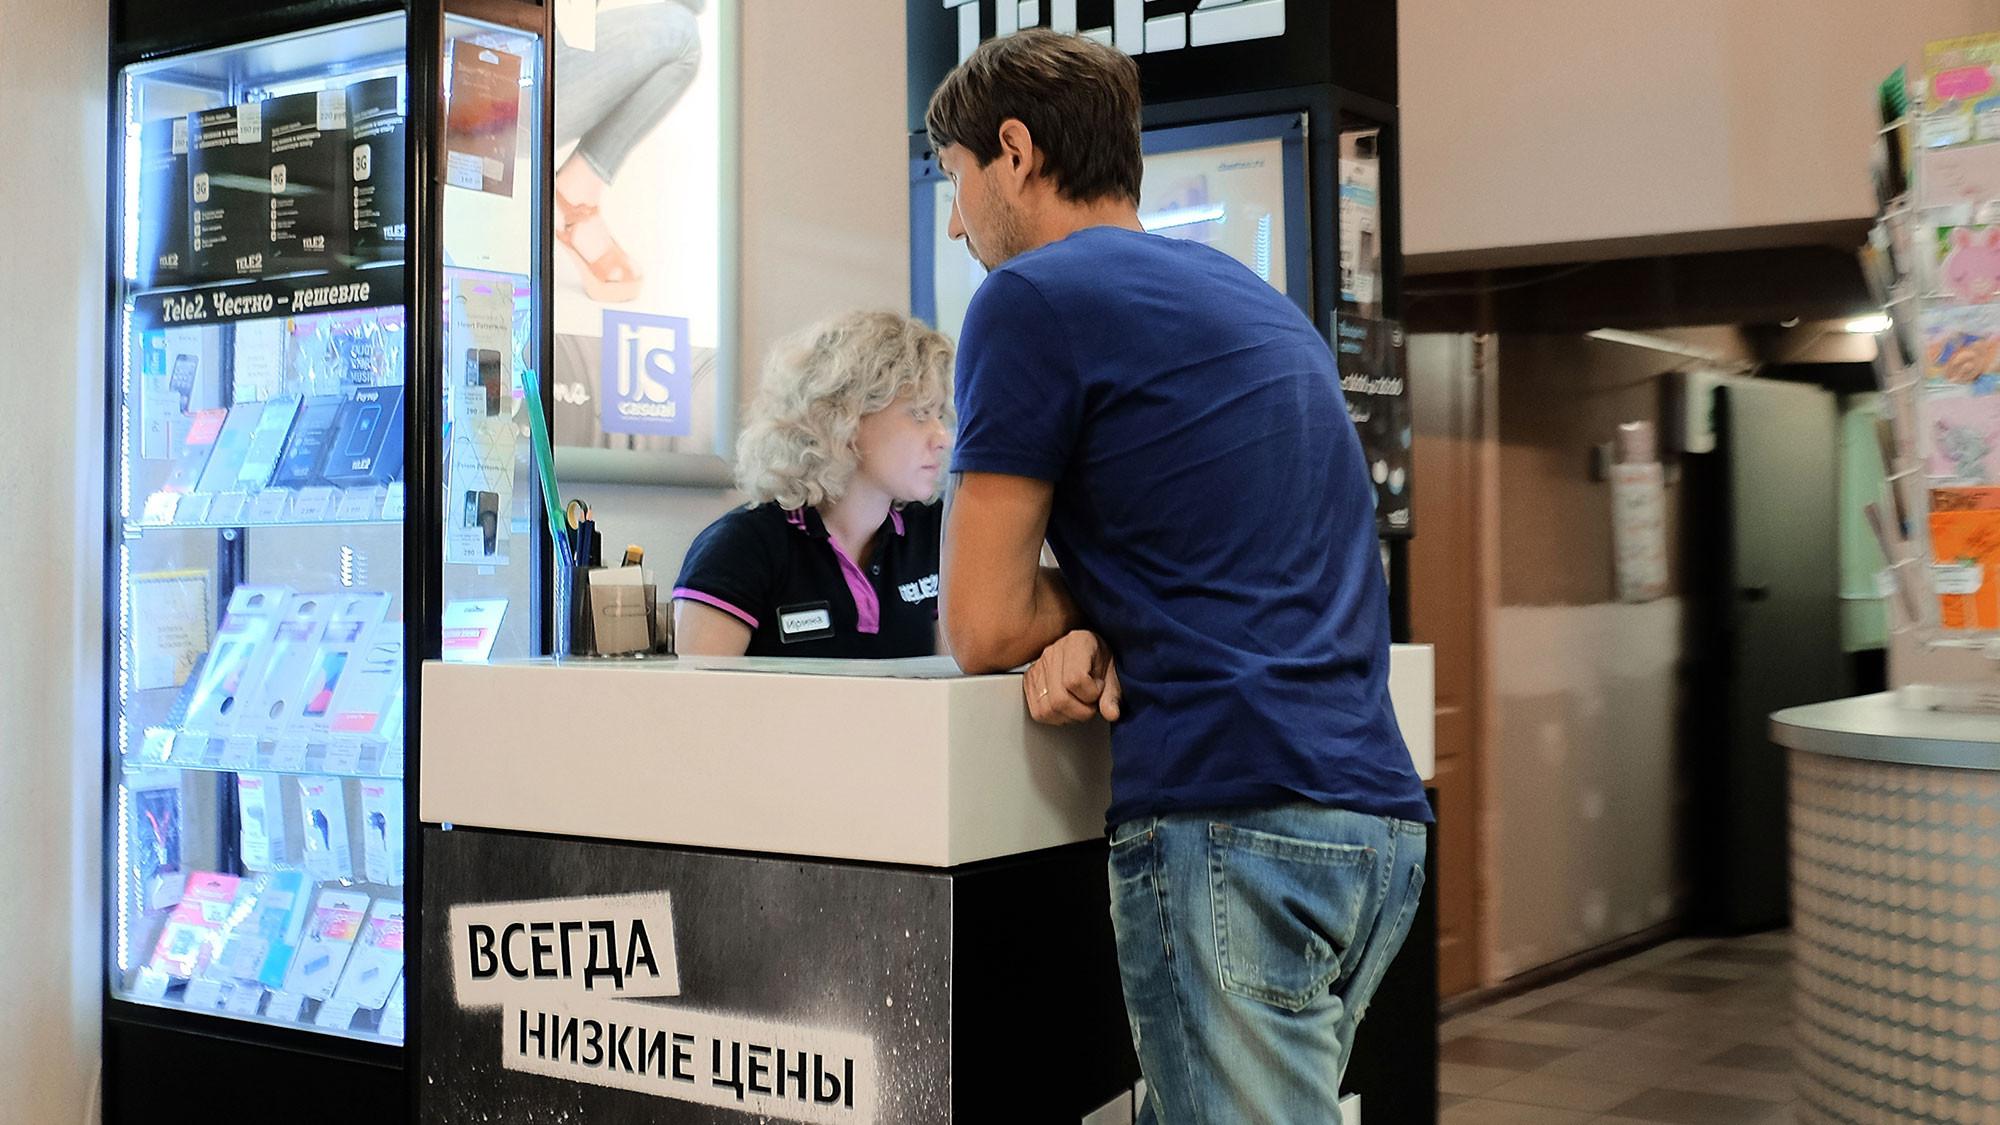 <p><span>Фото: &copy; РИА Новости / Наталья Селиверстова</span></p>